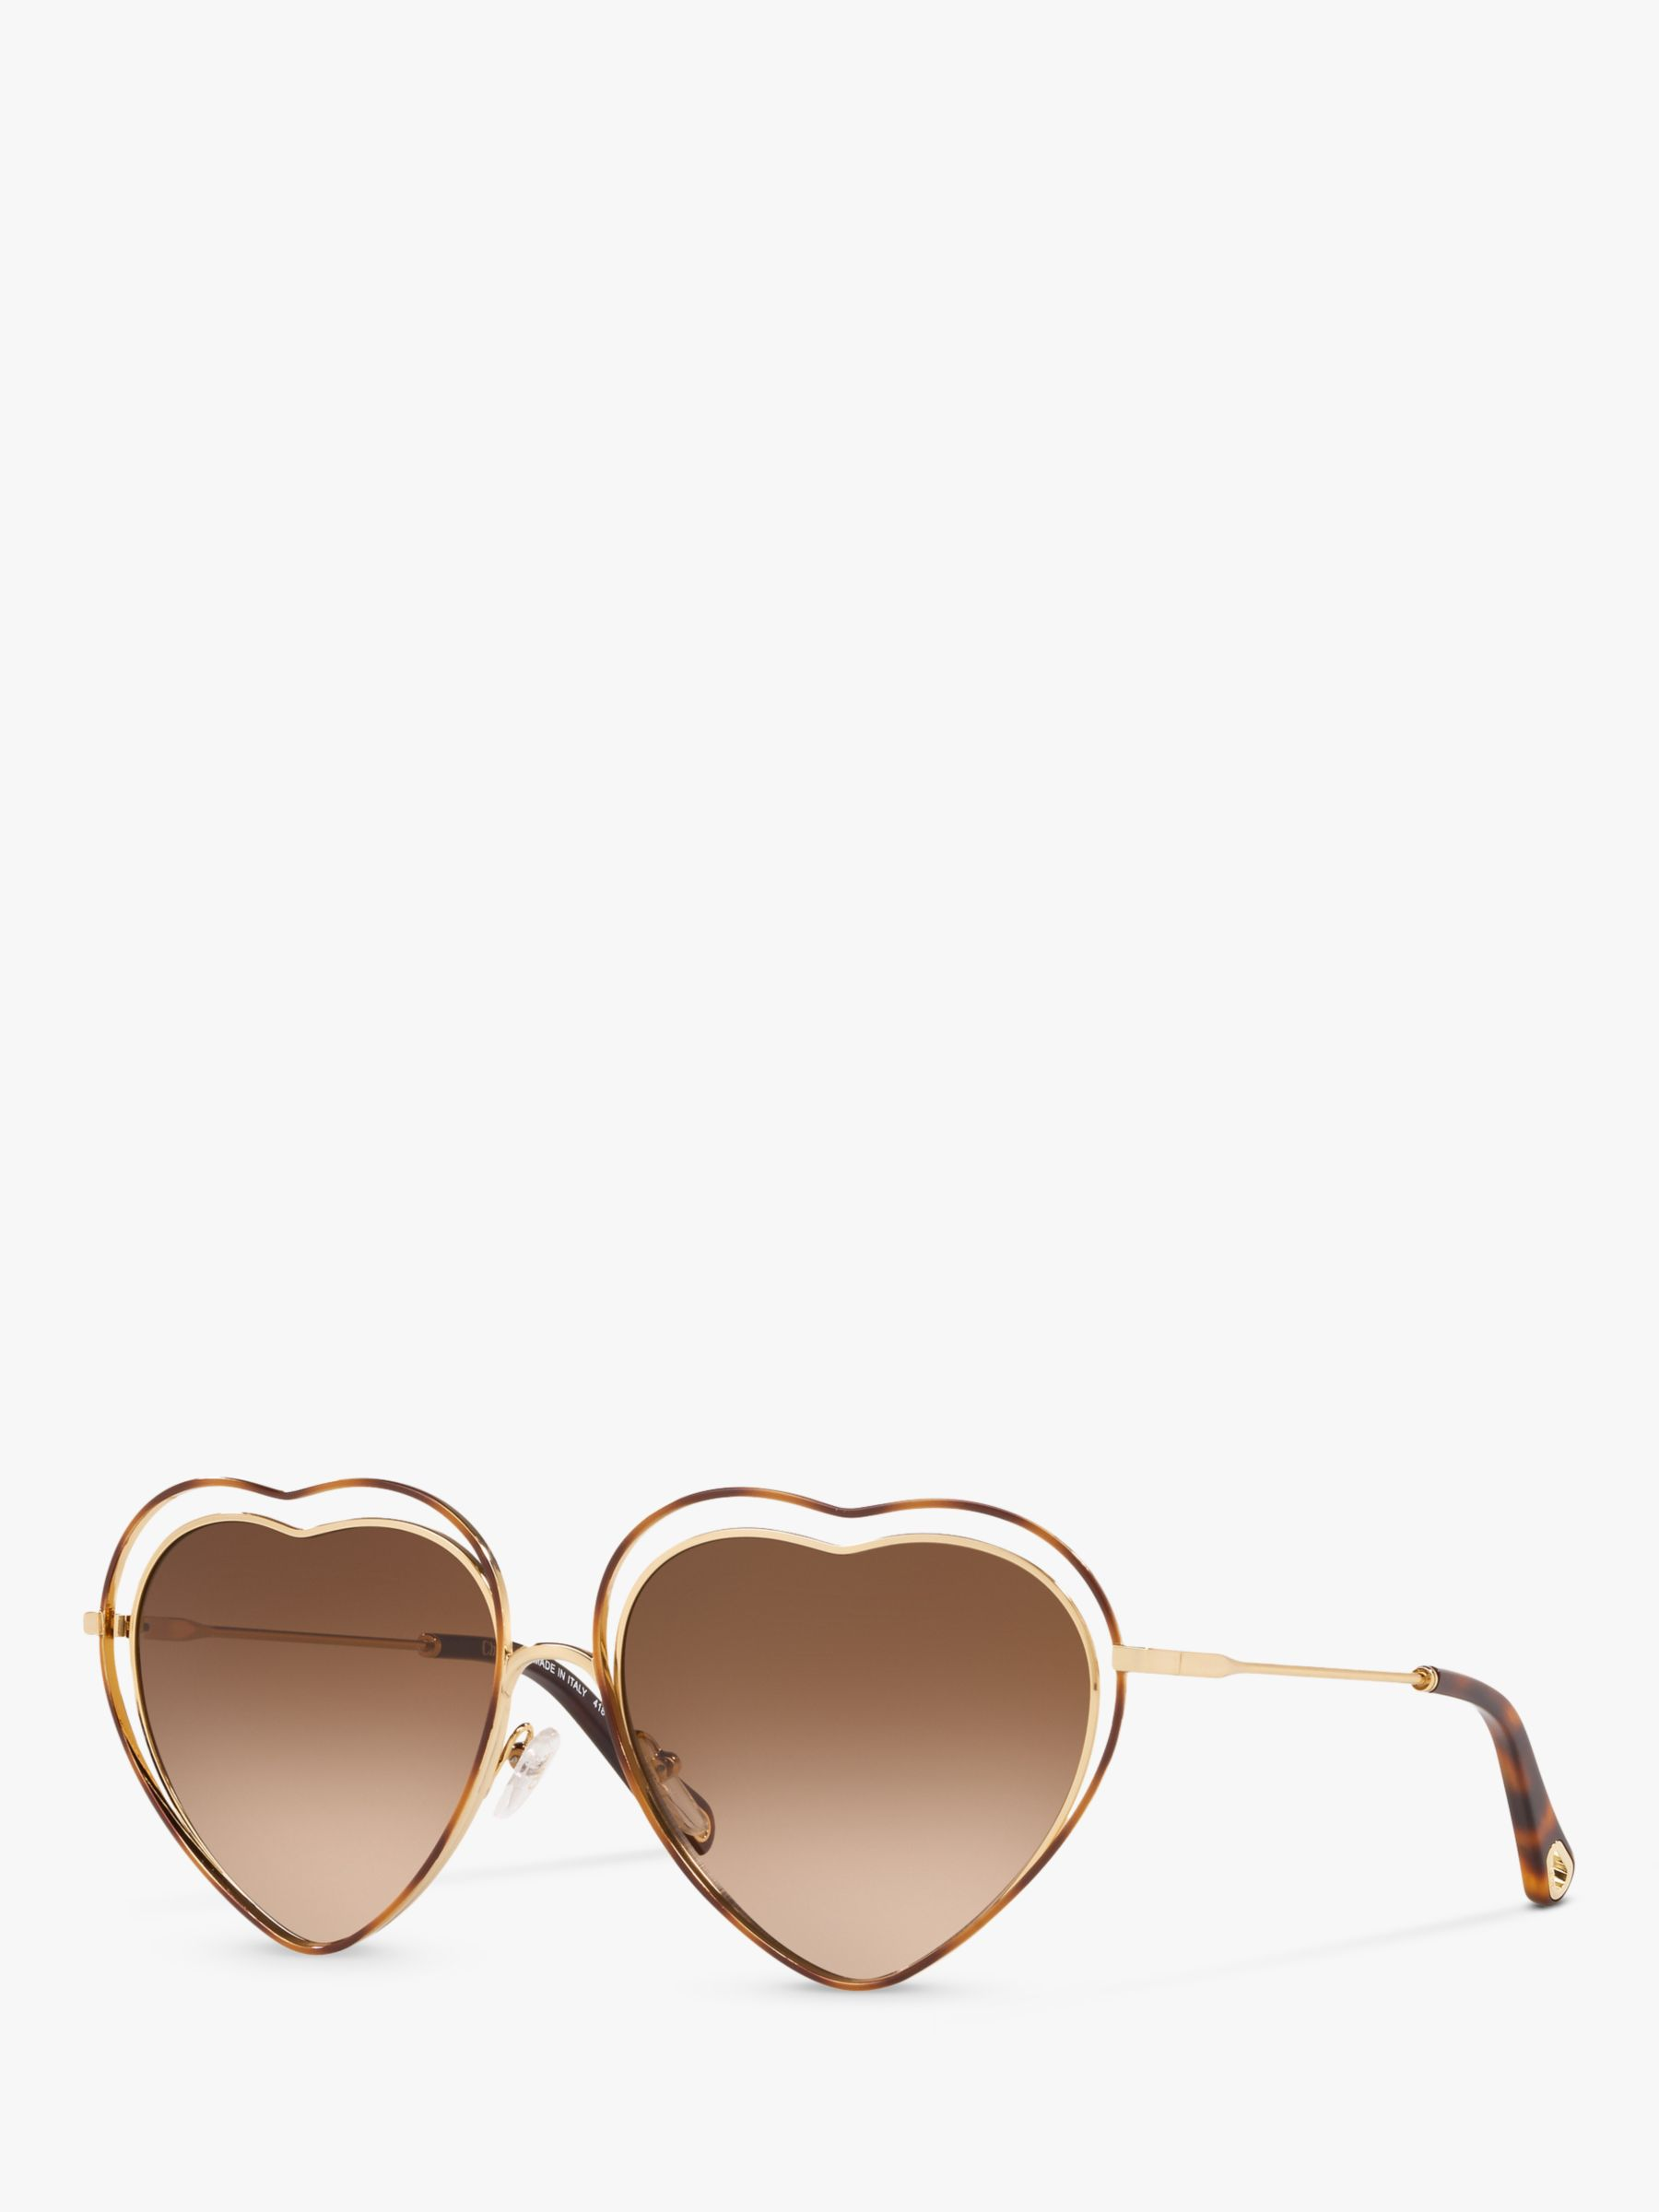 Chloe Chloé CE125S Women's Heart Sunglasses, Brown